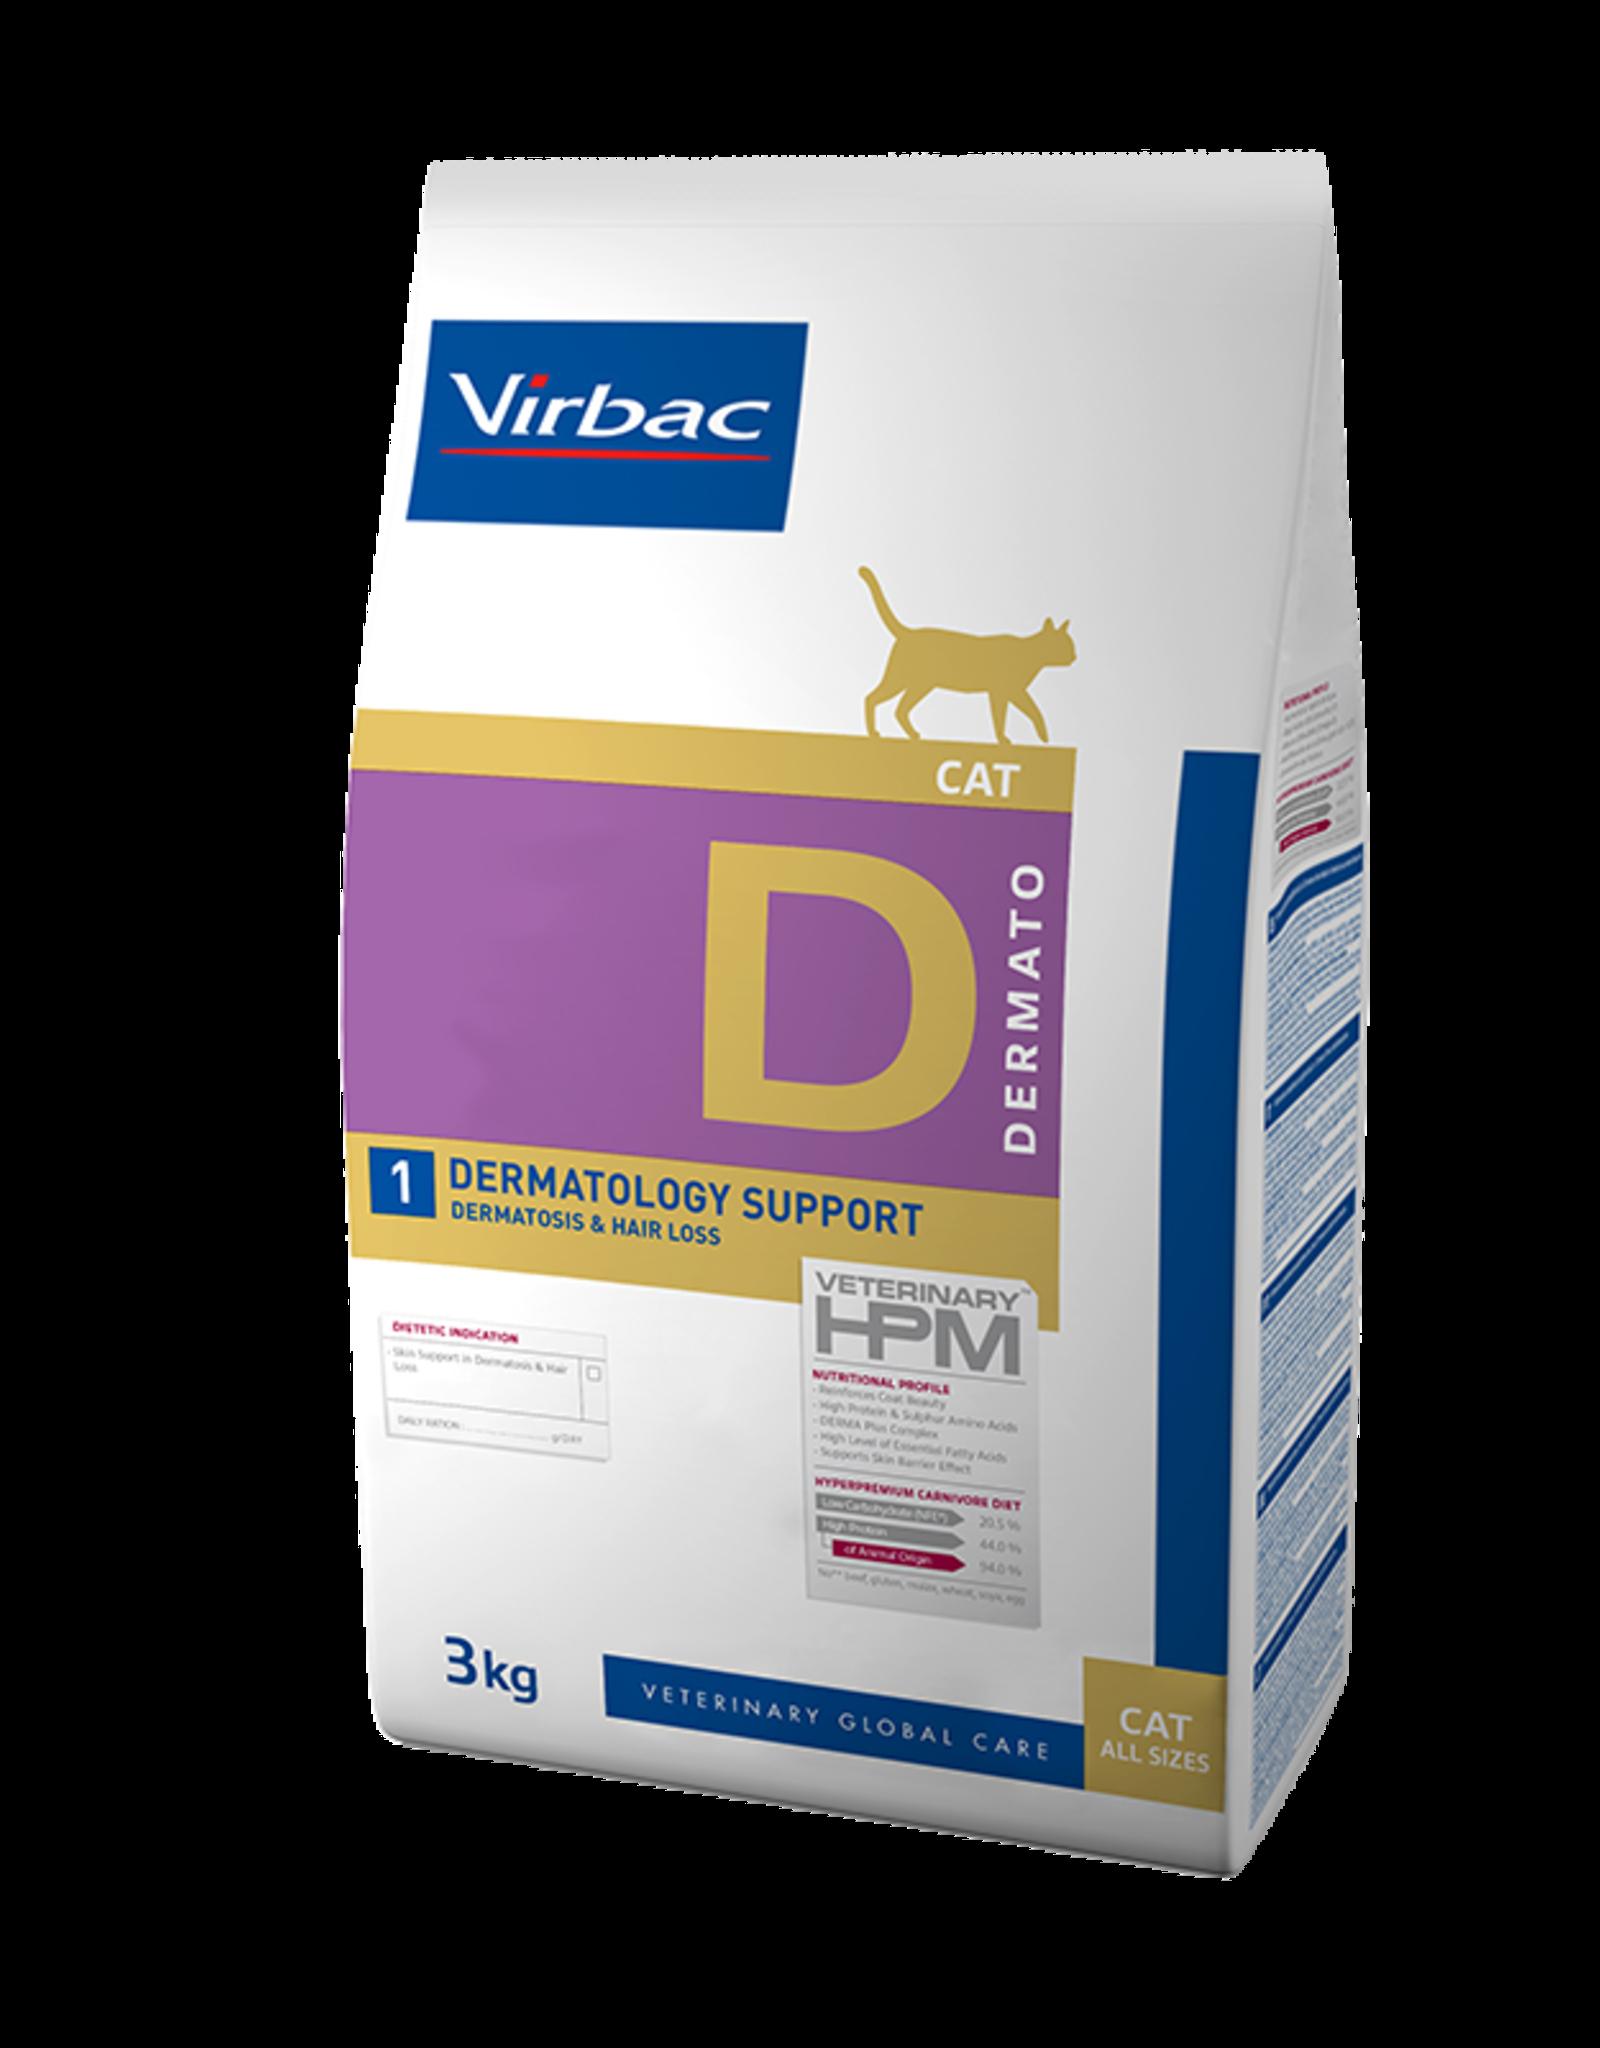 Virbac Virbac Hpm Cat Dermatology Support D1 3kg